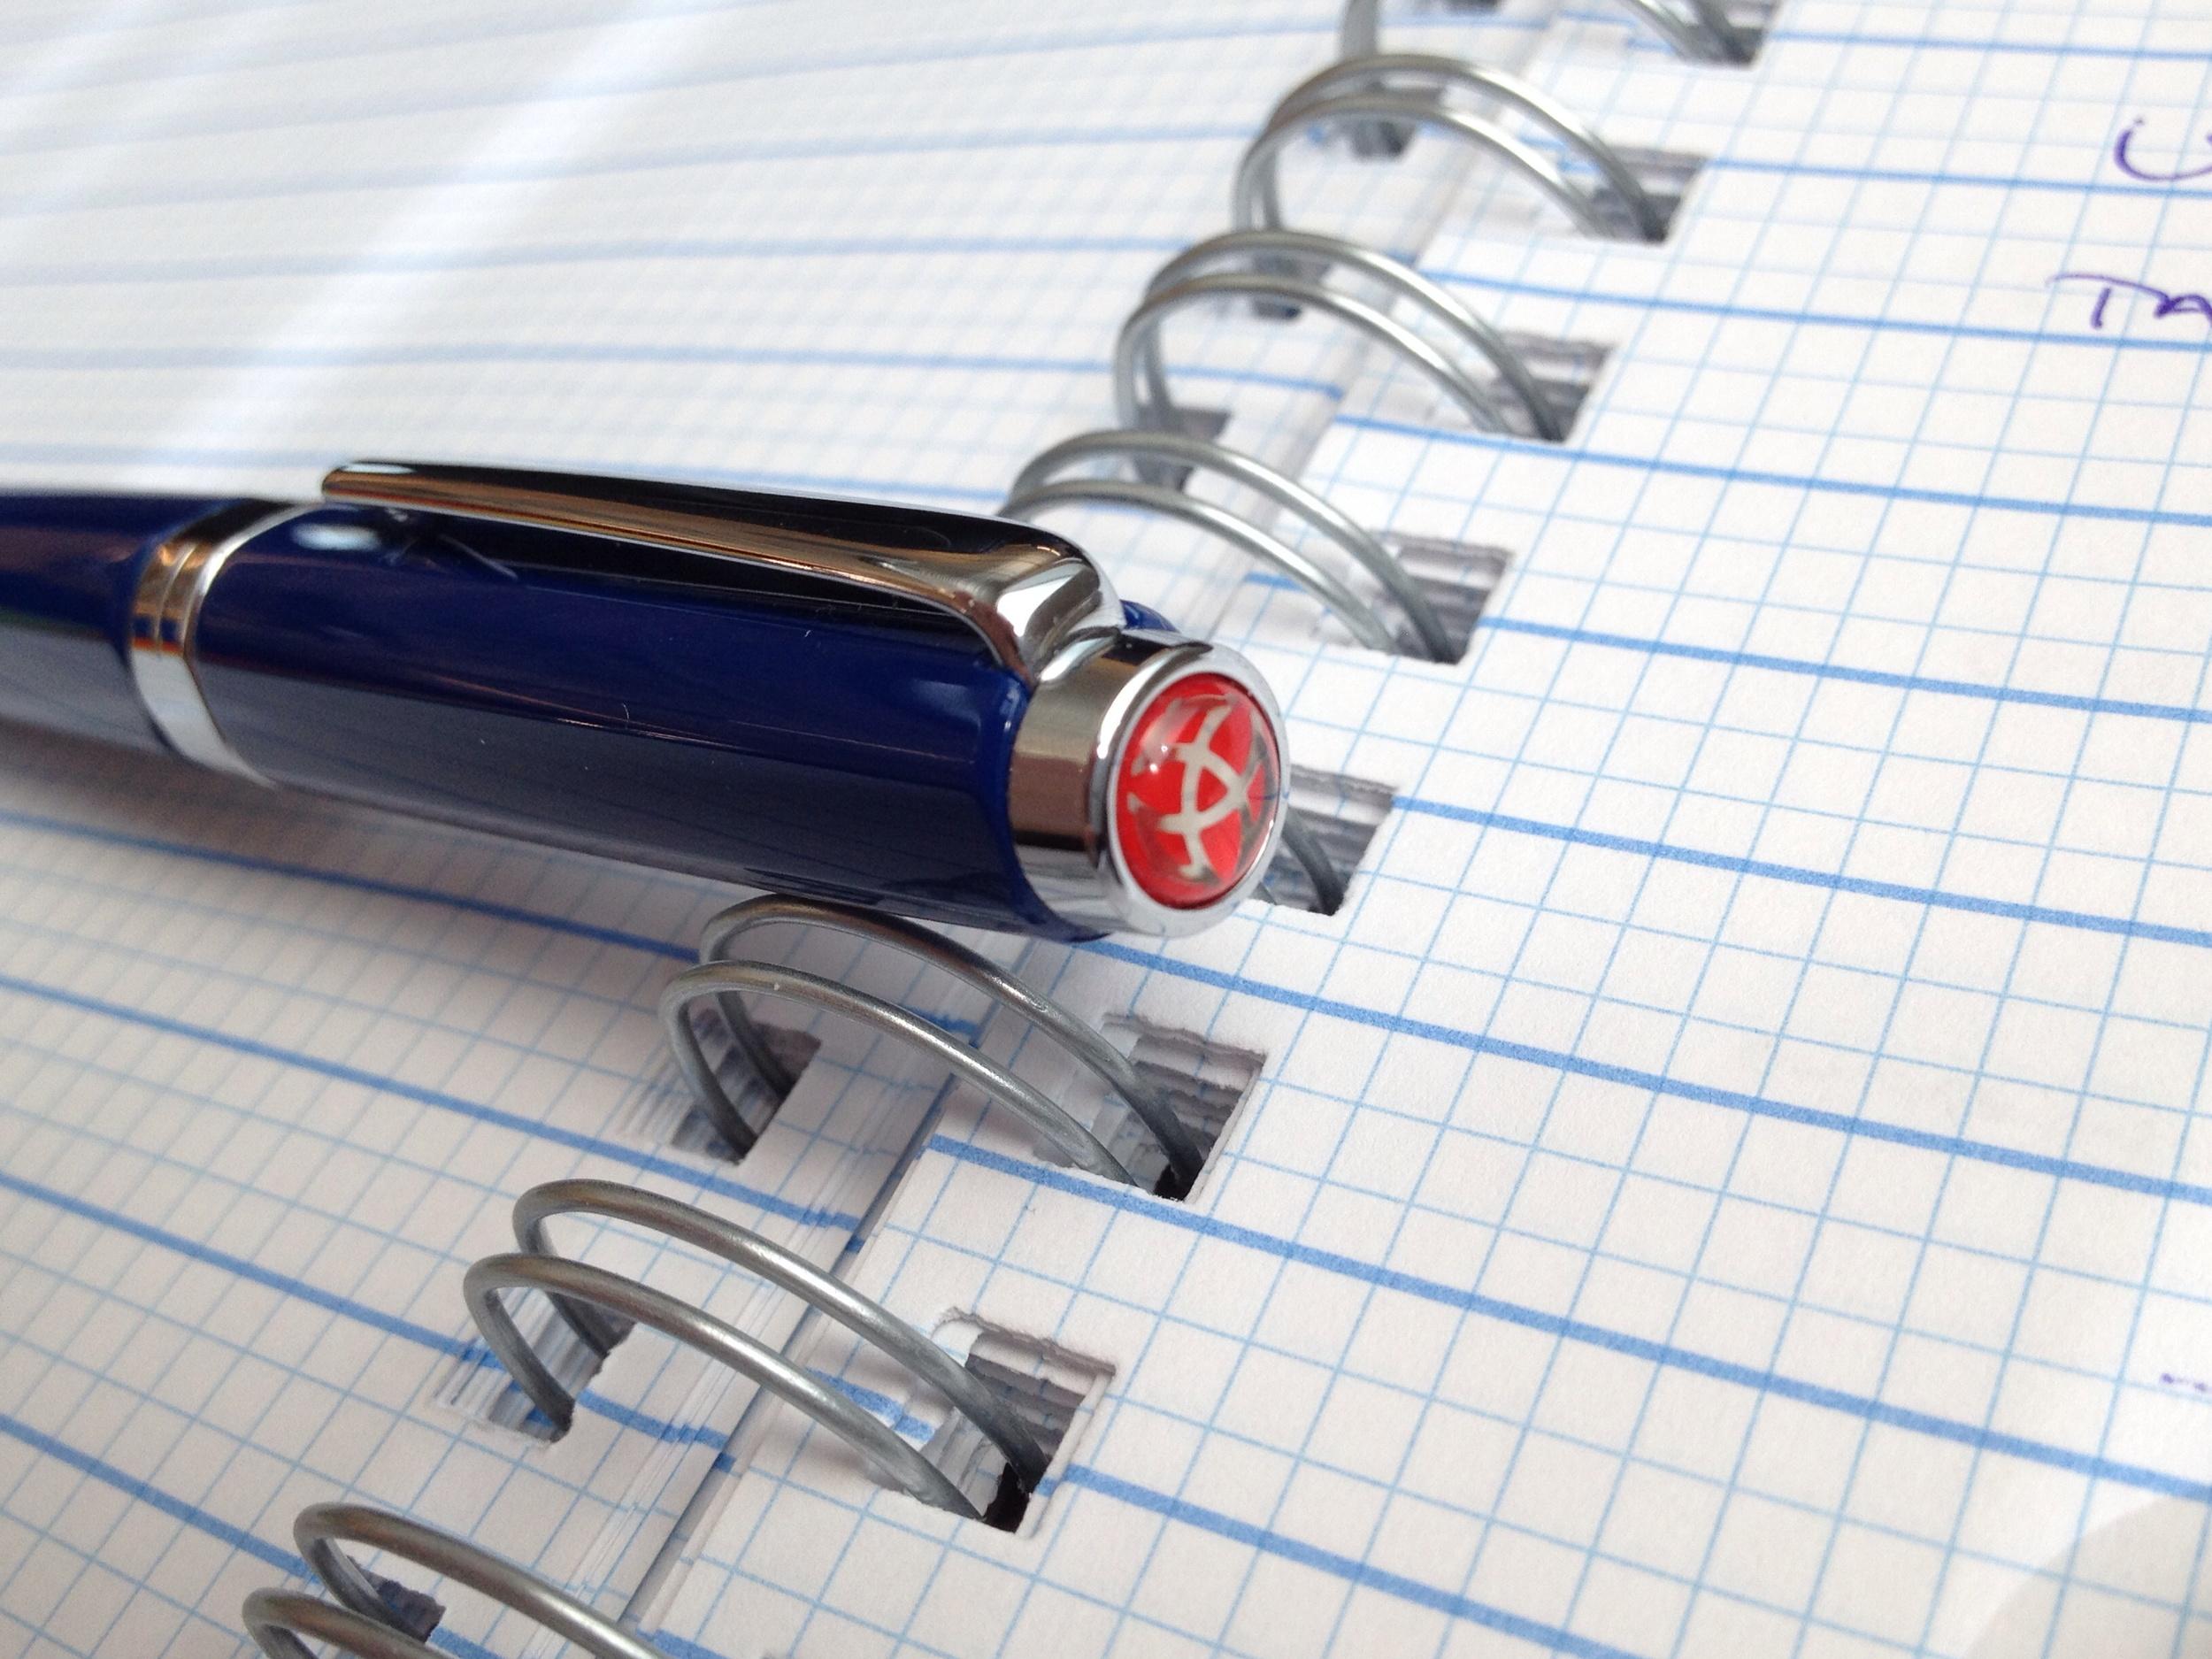 TWSBI Blue Classic 1.1 Stub Pen Review